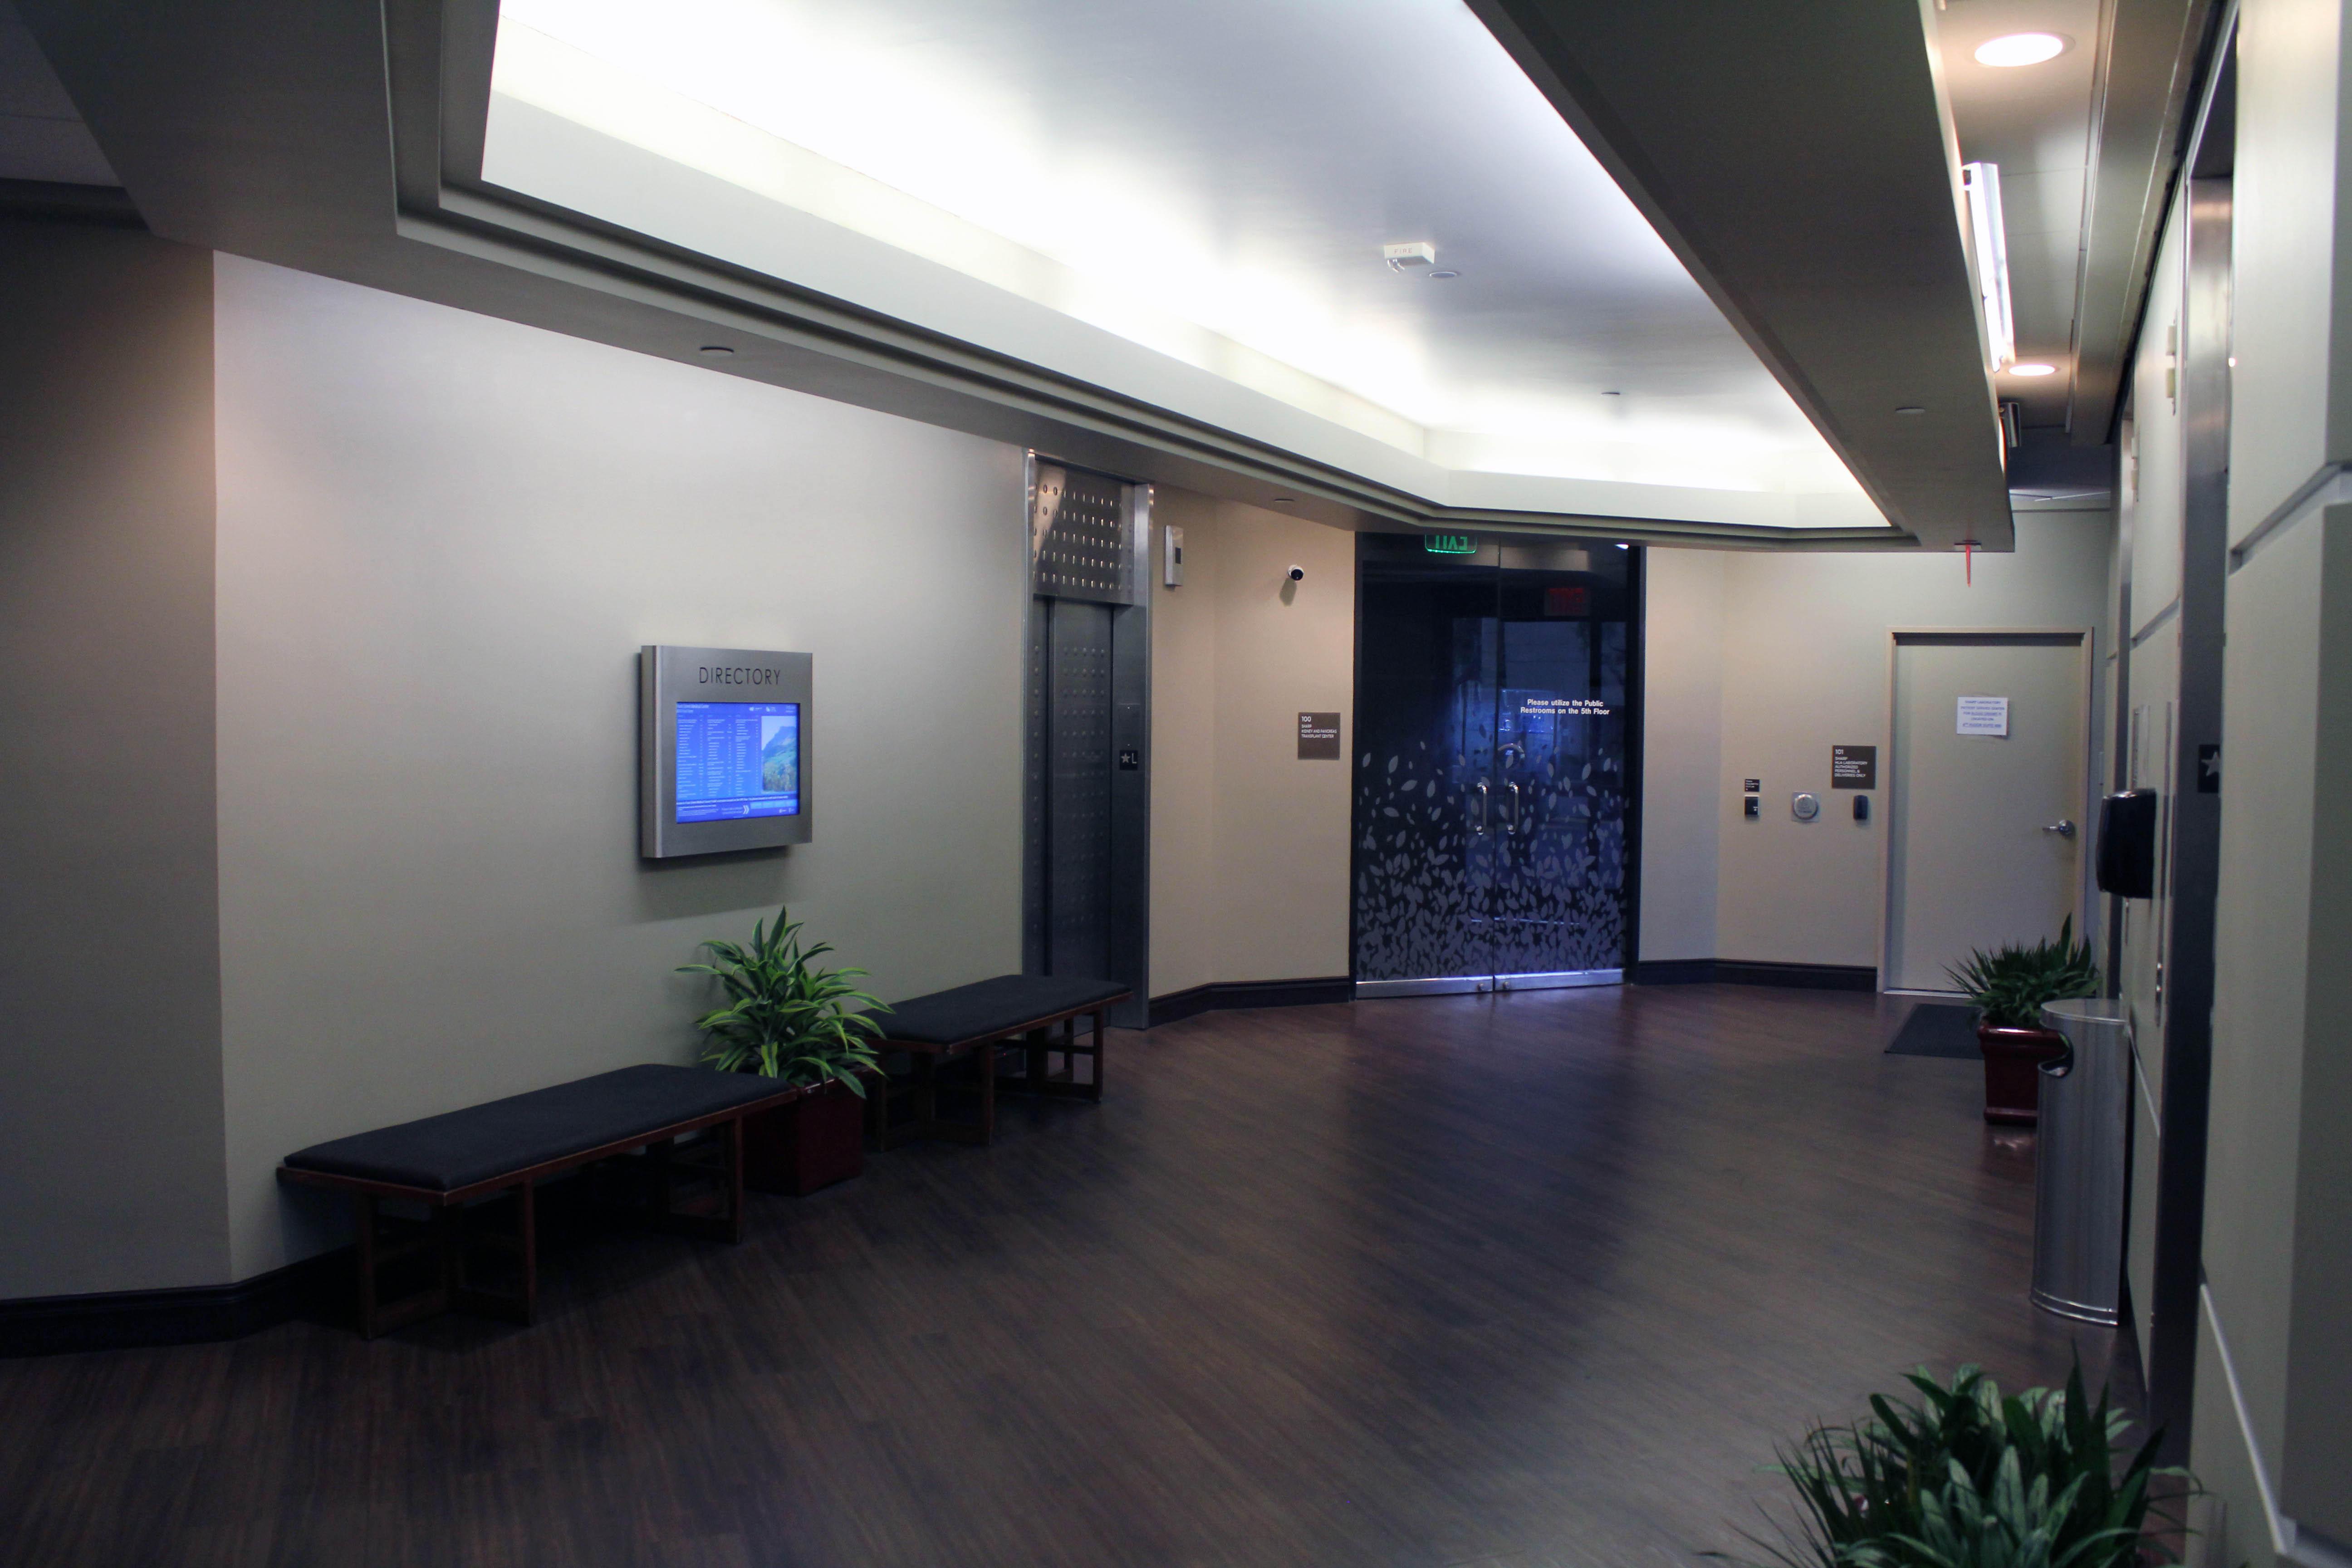 Cranial Technologies image 2